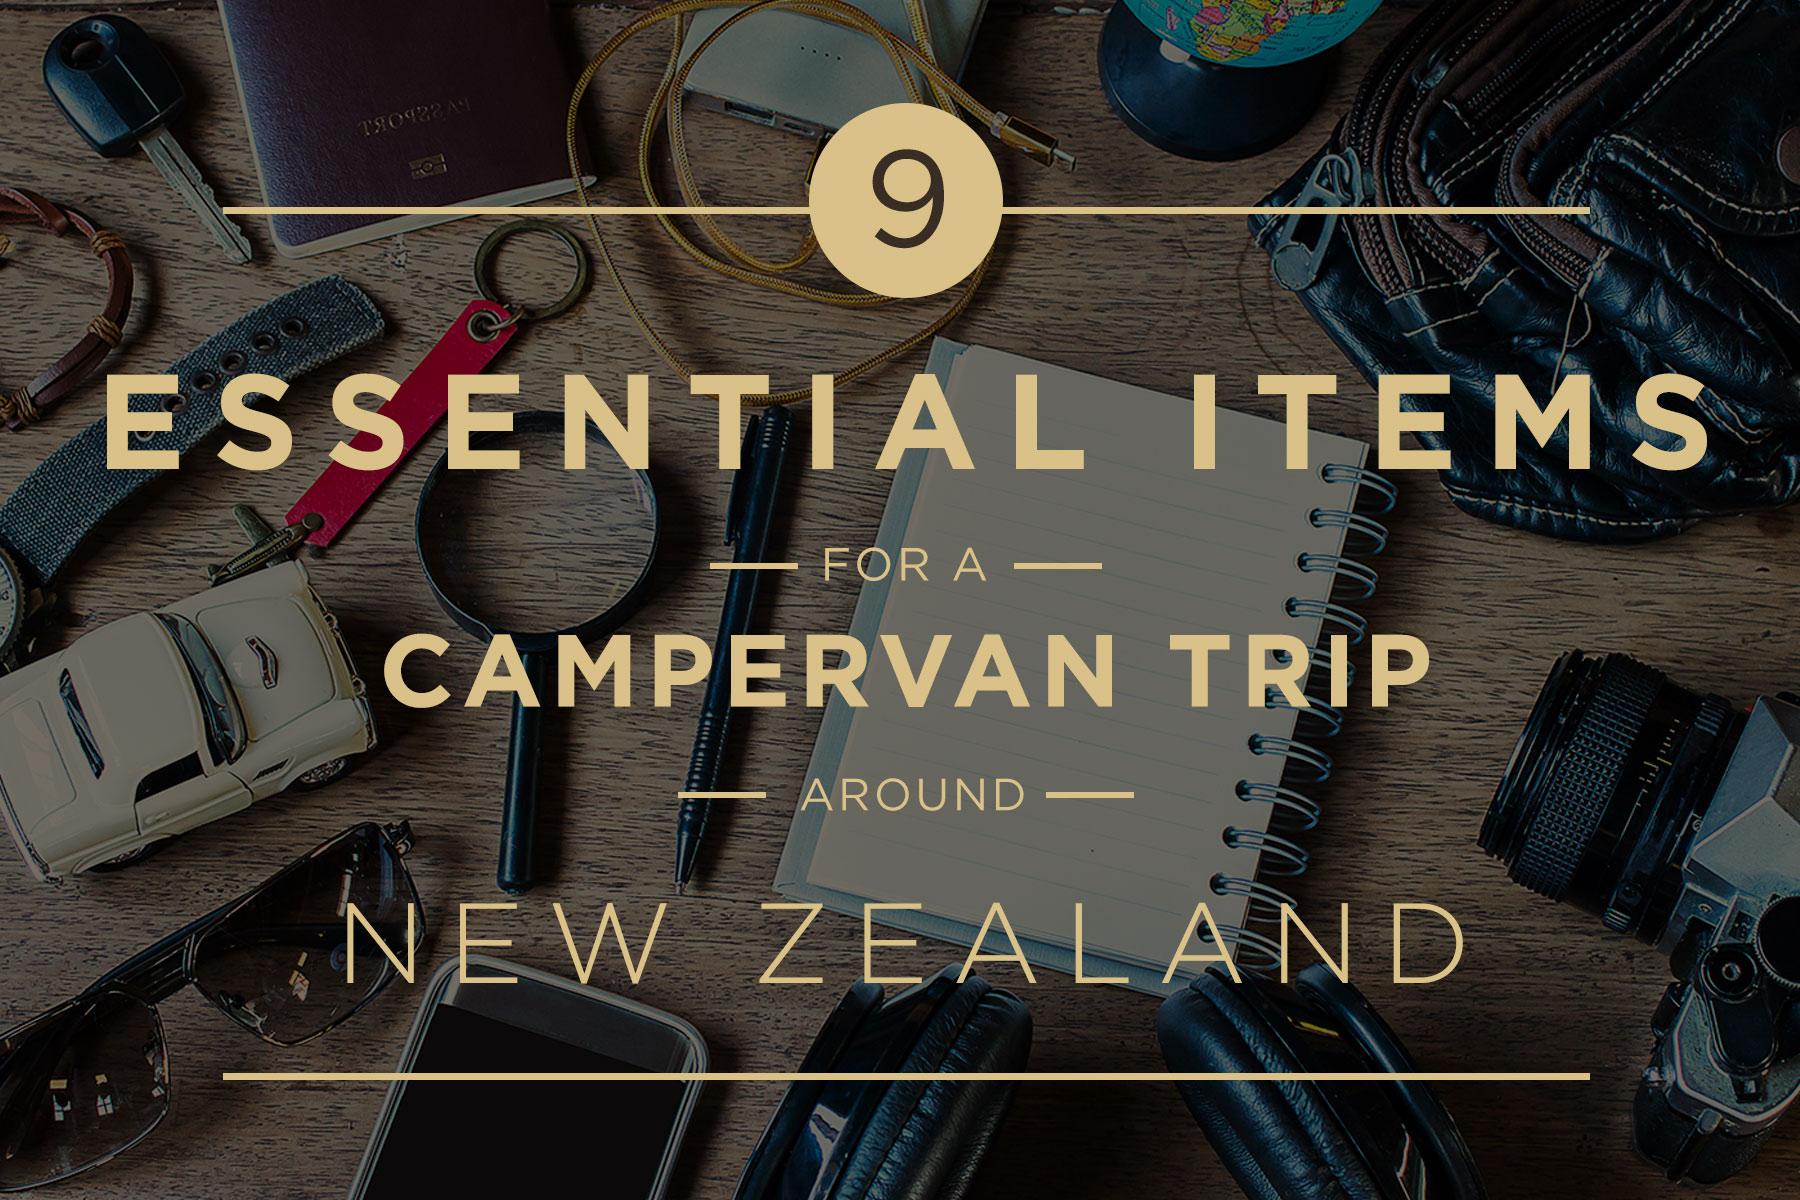 9-essential-items-campervan-trip-new-zealand-freelancehoneymoon